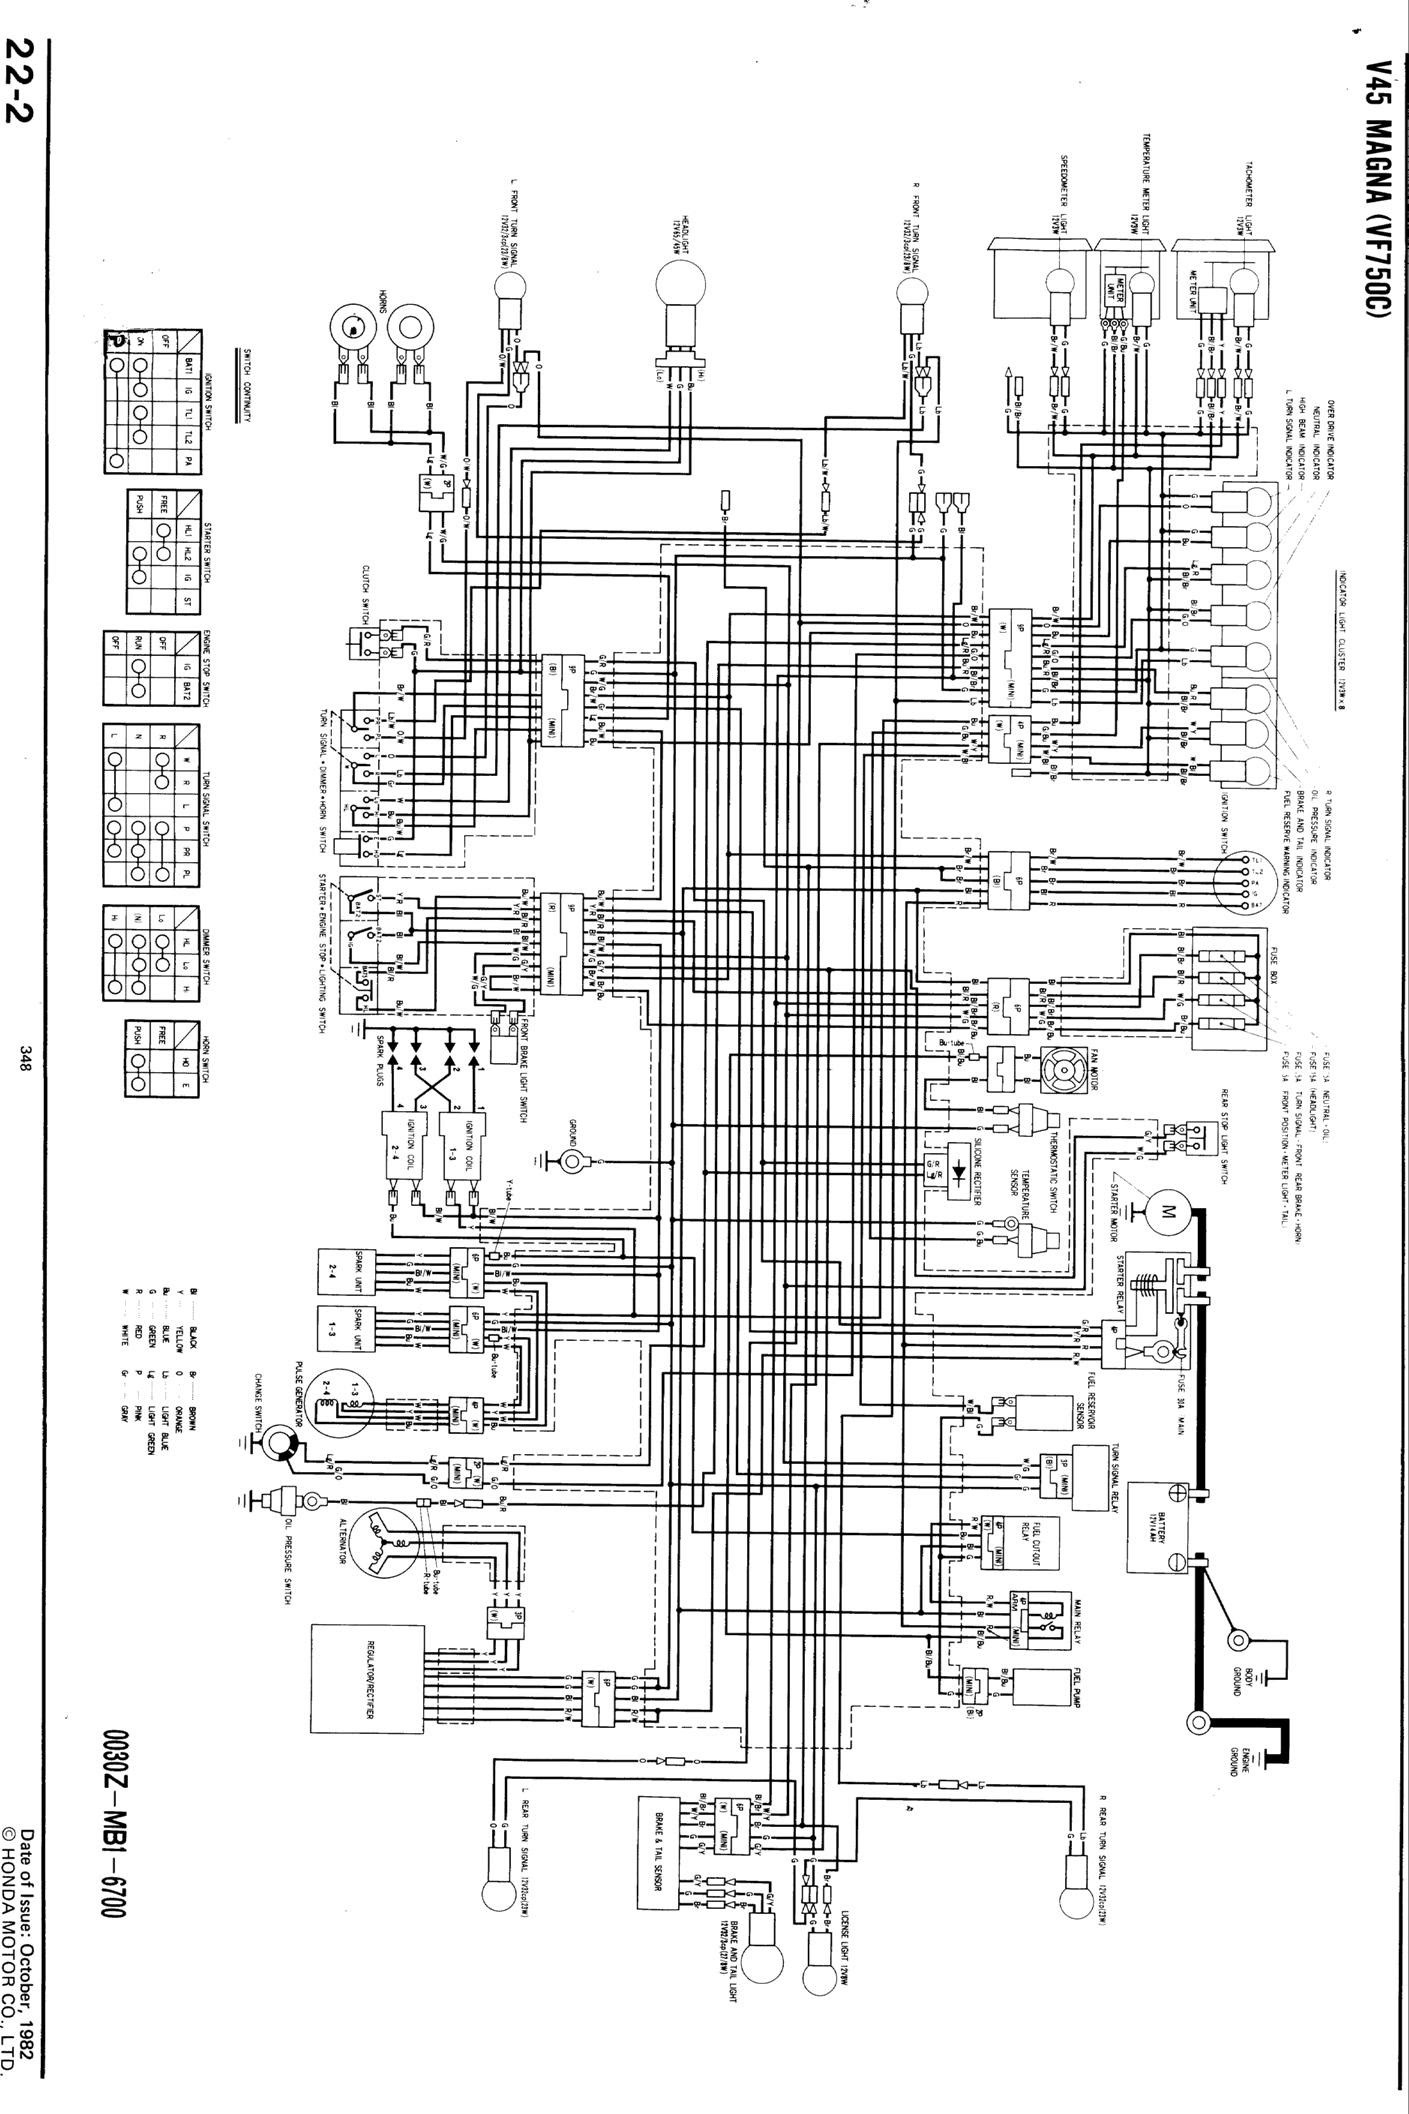 Honda V65 Sabre Wiring Diagram - Wiring Diagram